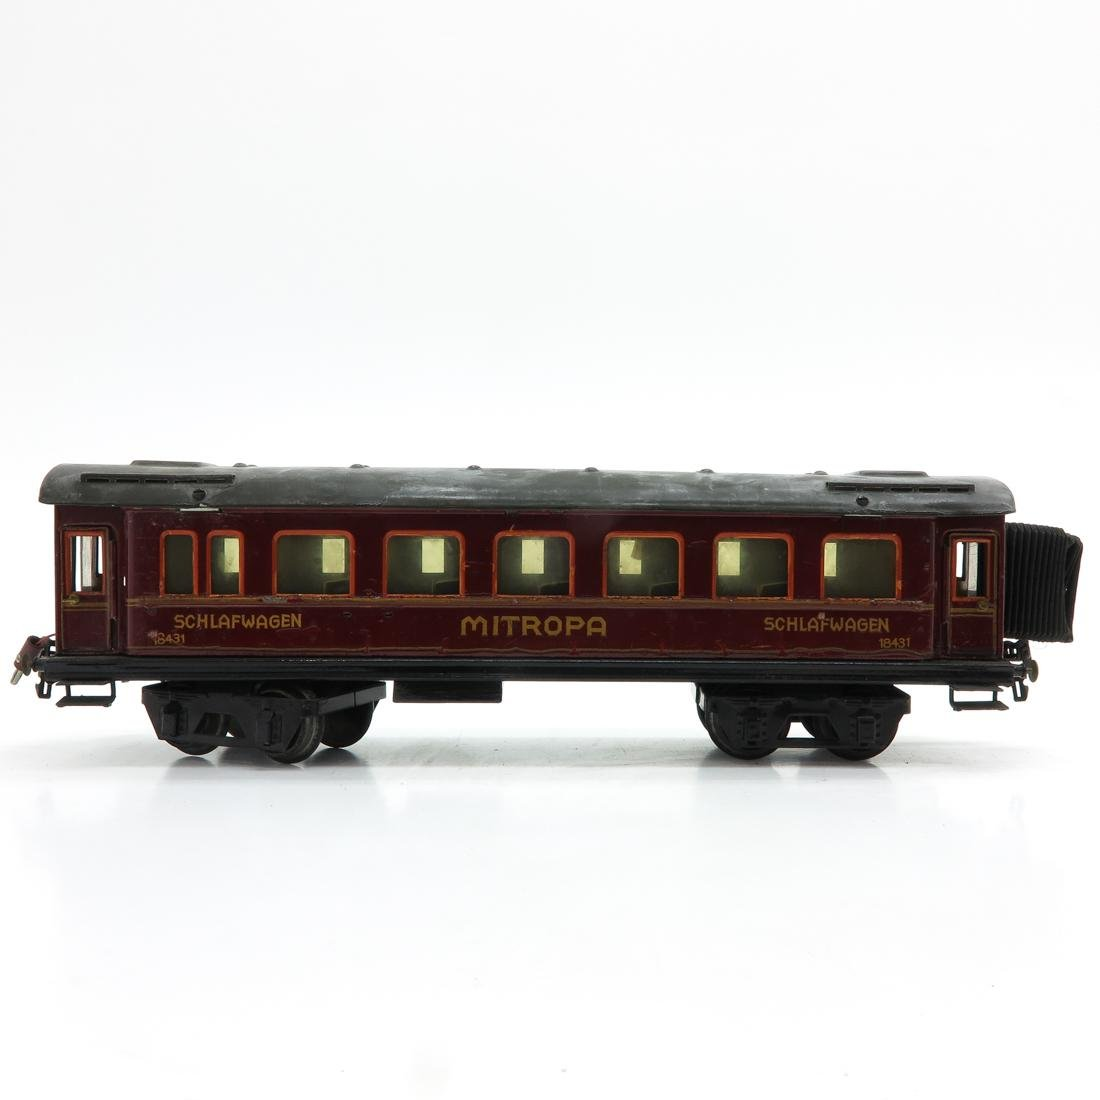 Vintage Marklin Mitropa Passenger Car - 3